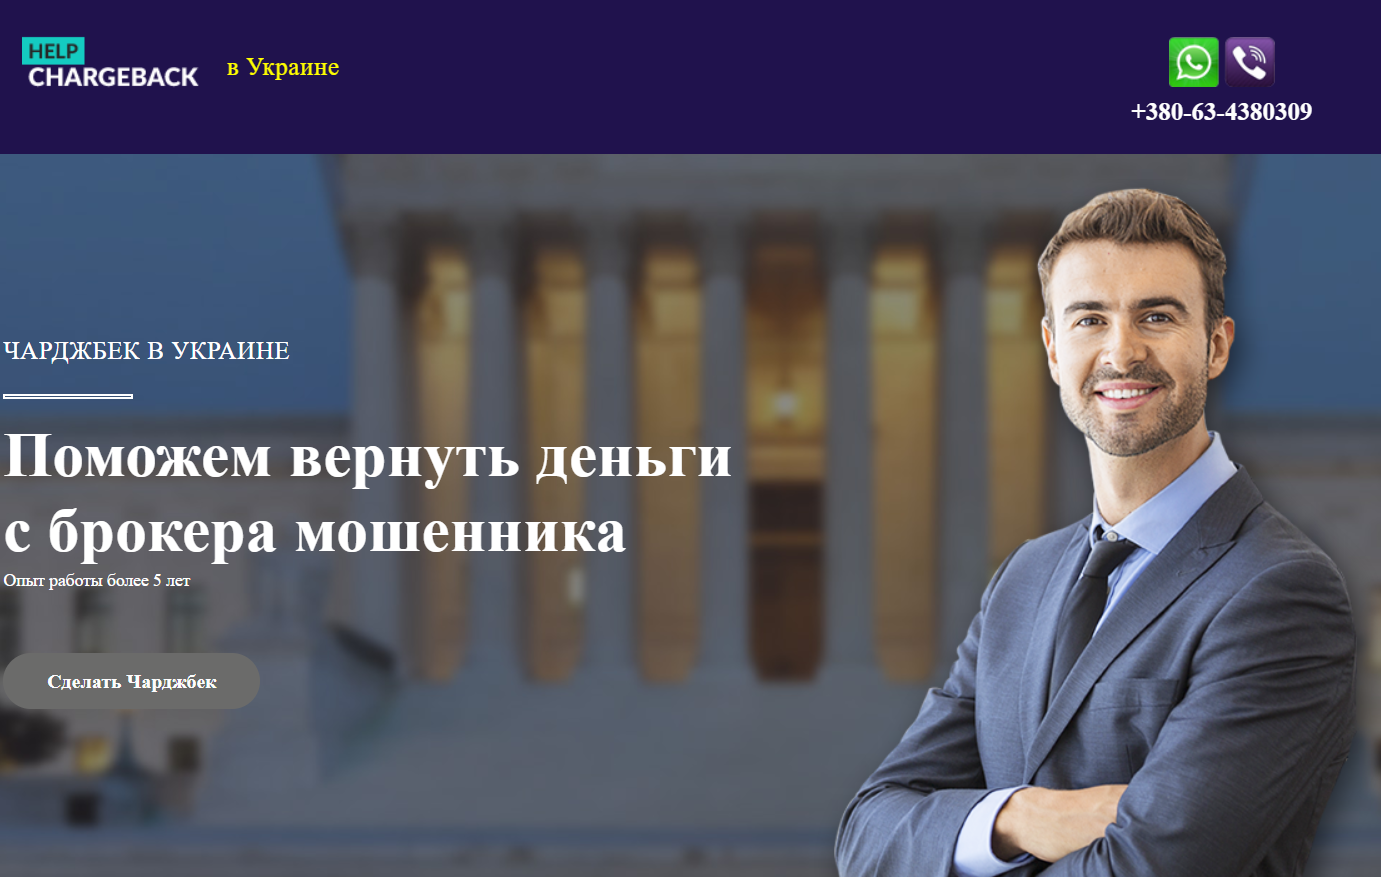 ua.helpchargeback.ru Chargeback в Украине